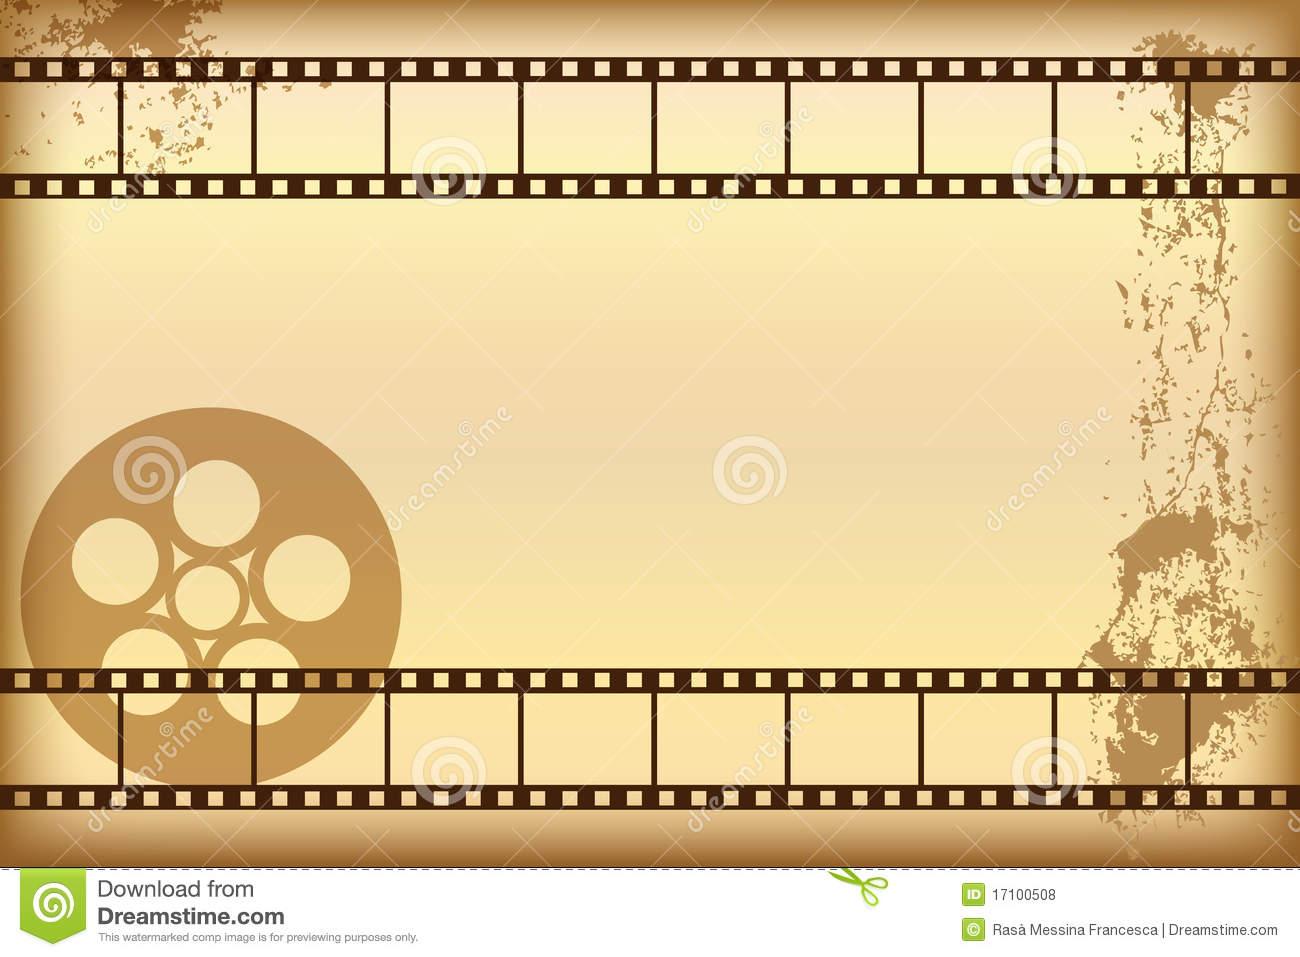 Movie Background Desktop Image 1300x957